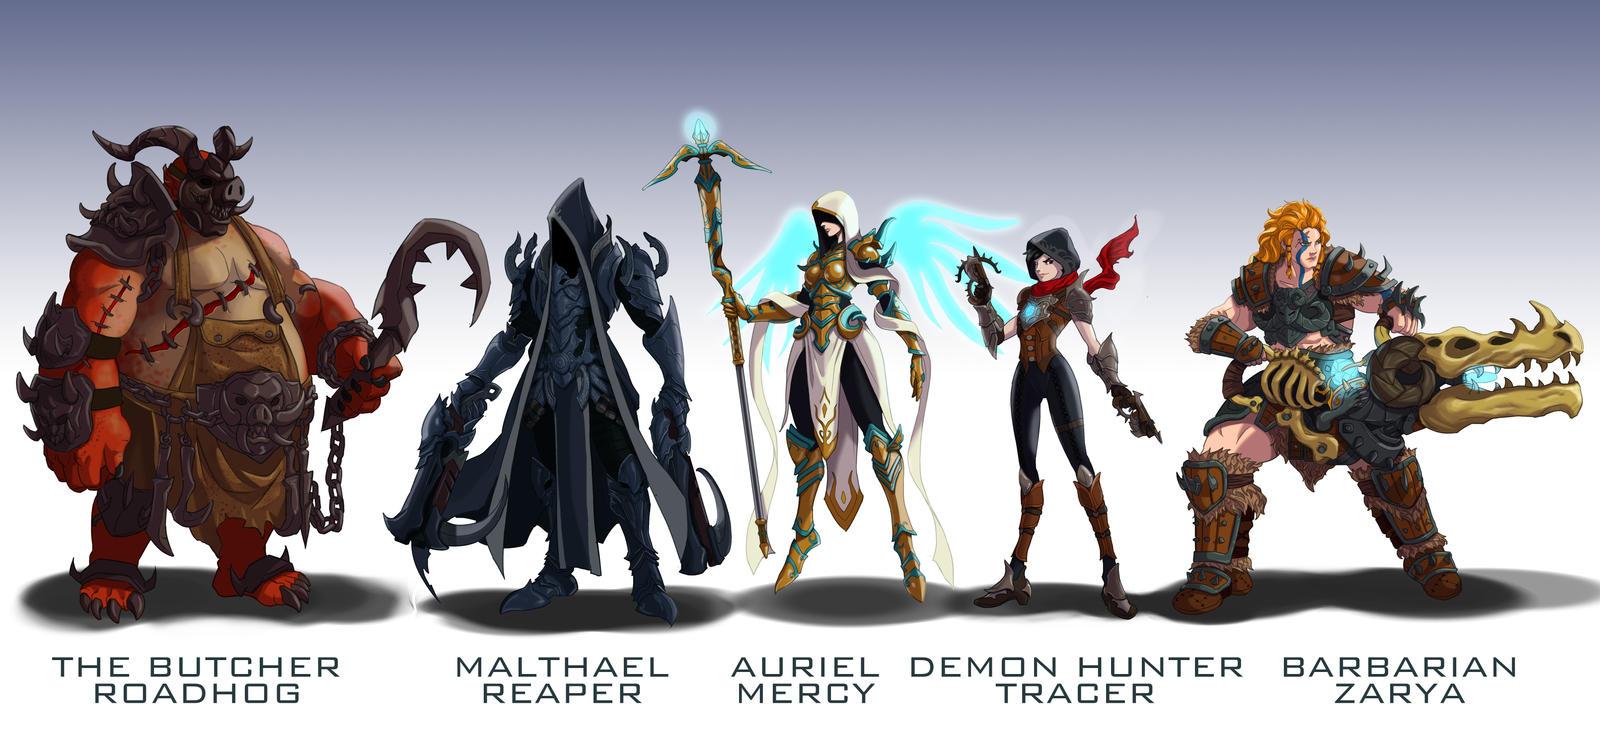 Overwatch Blizzard mashup skins 2 by wildcard24